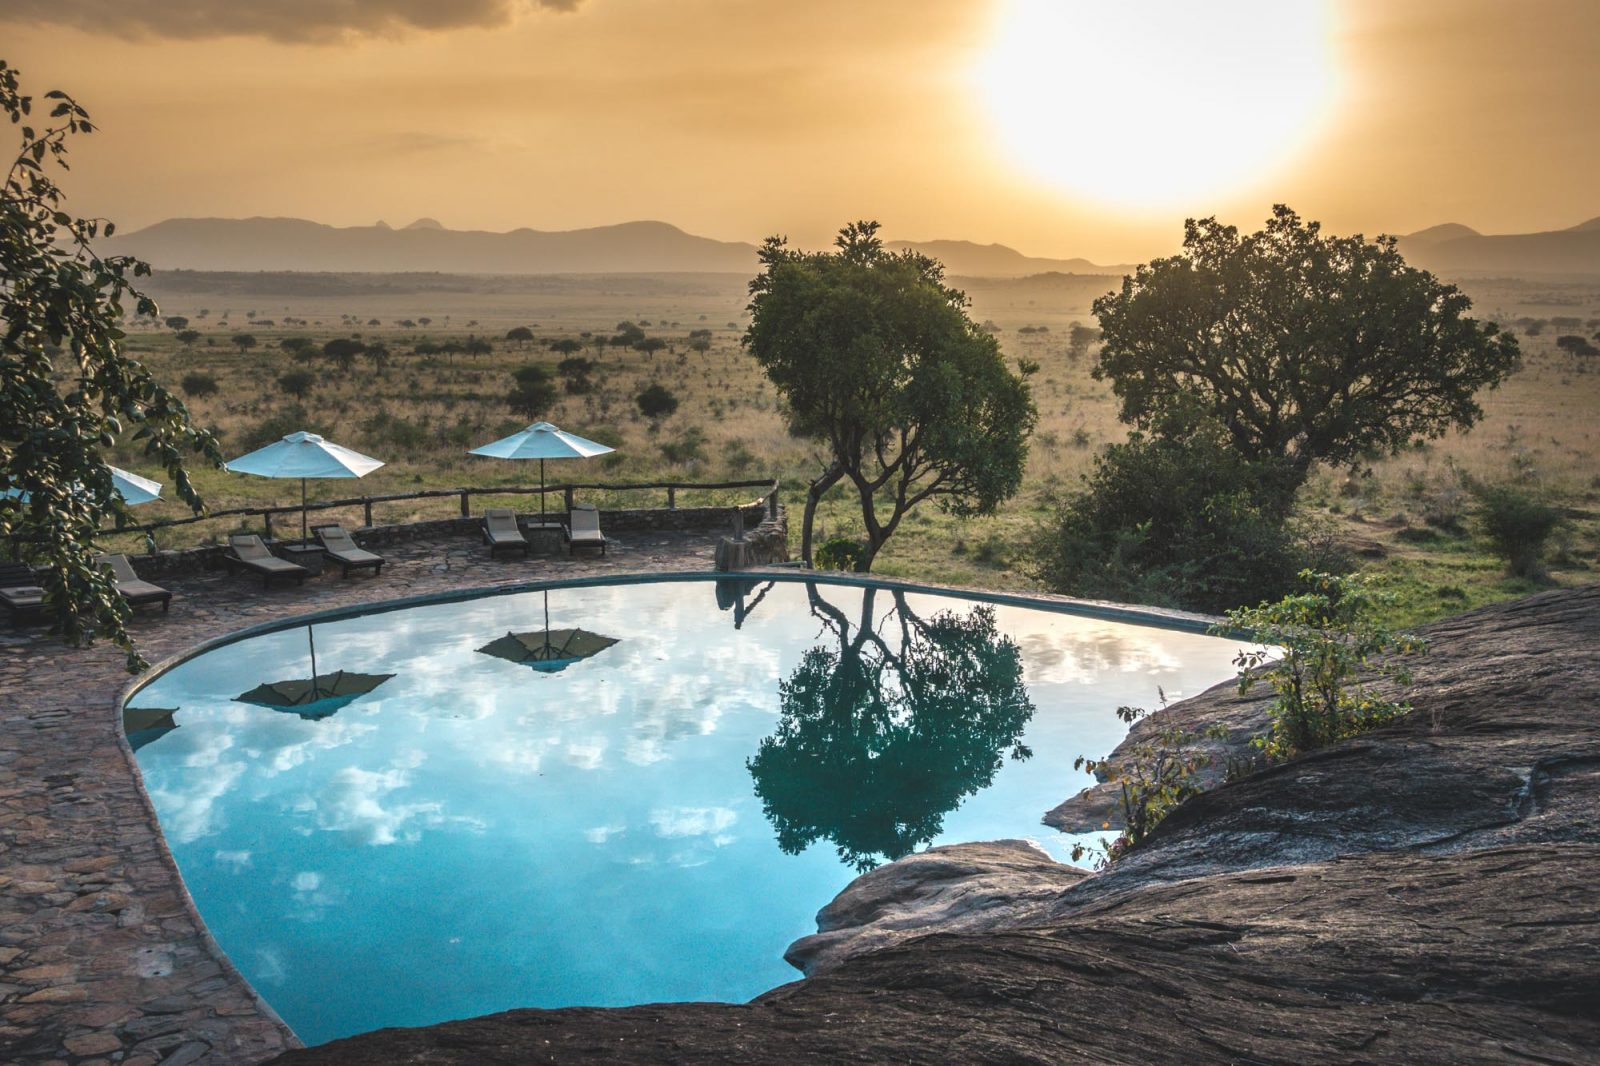 Pool at the Apoka Safari Lodge